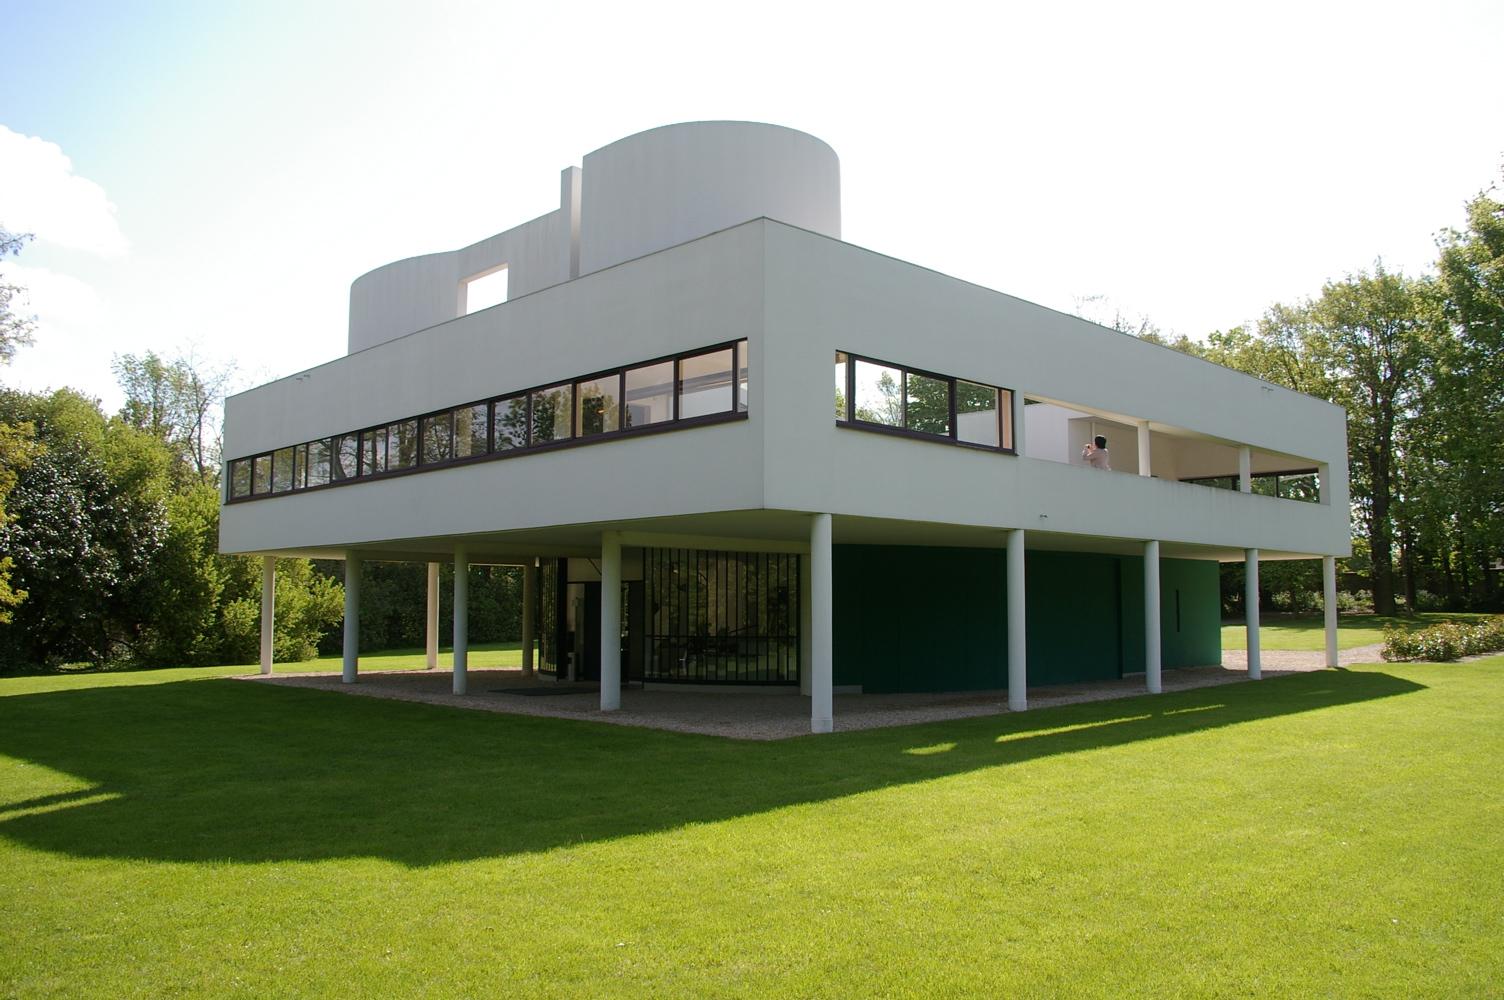 Villa savoye flickr photo sharing - Le corbusier villa savoye ...